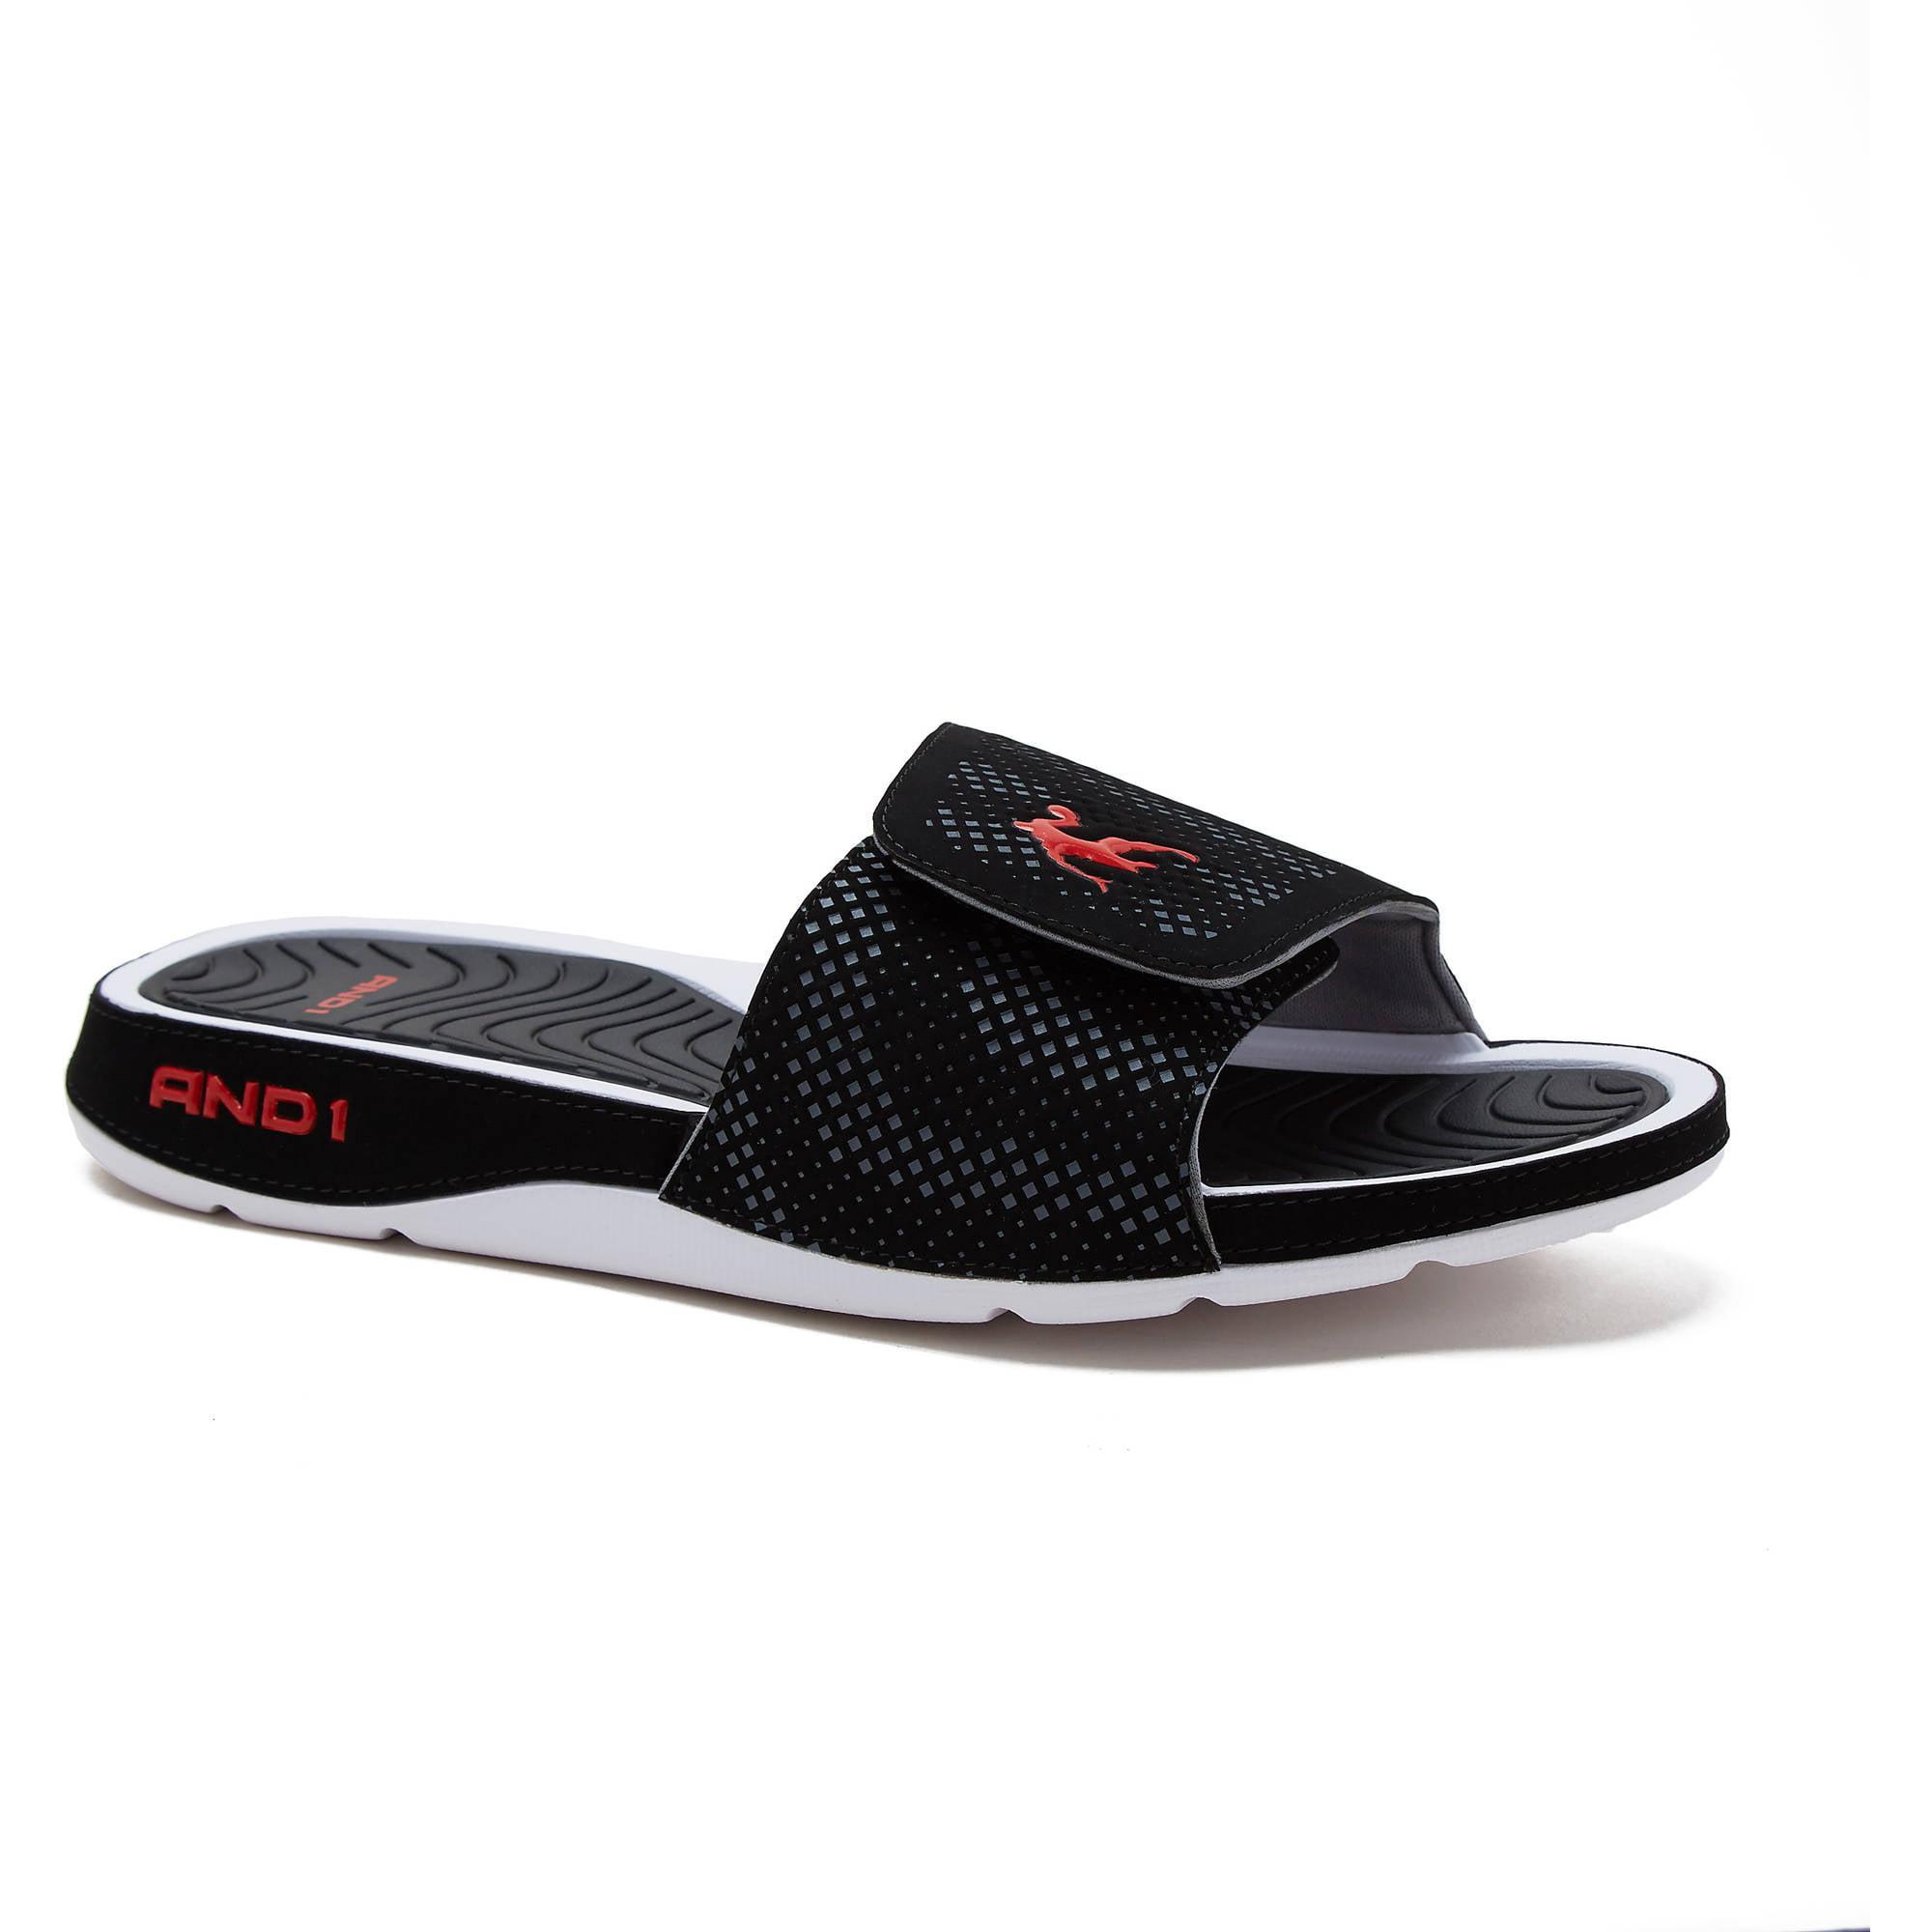 Men's Nike Air Force 1 Low '07 LV8 'Split' Black & White 905345 004